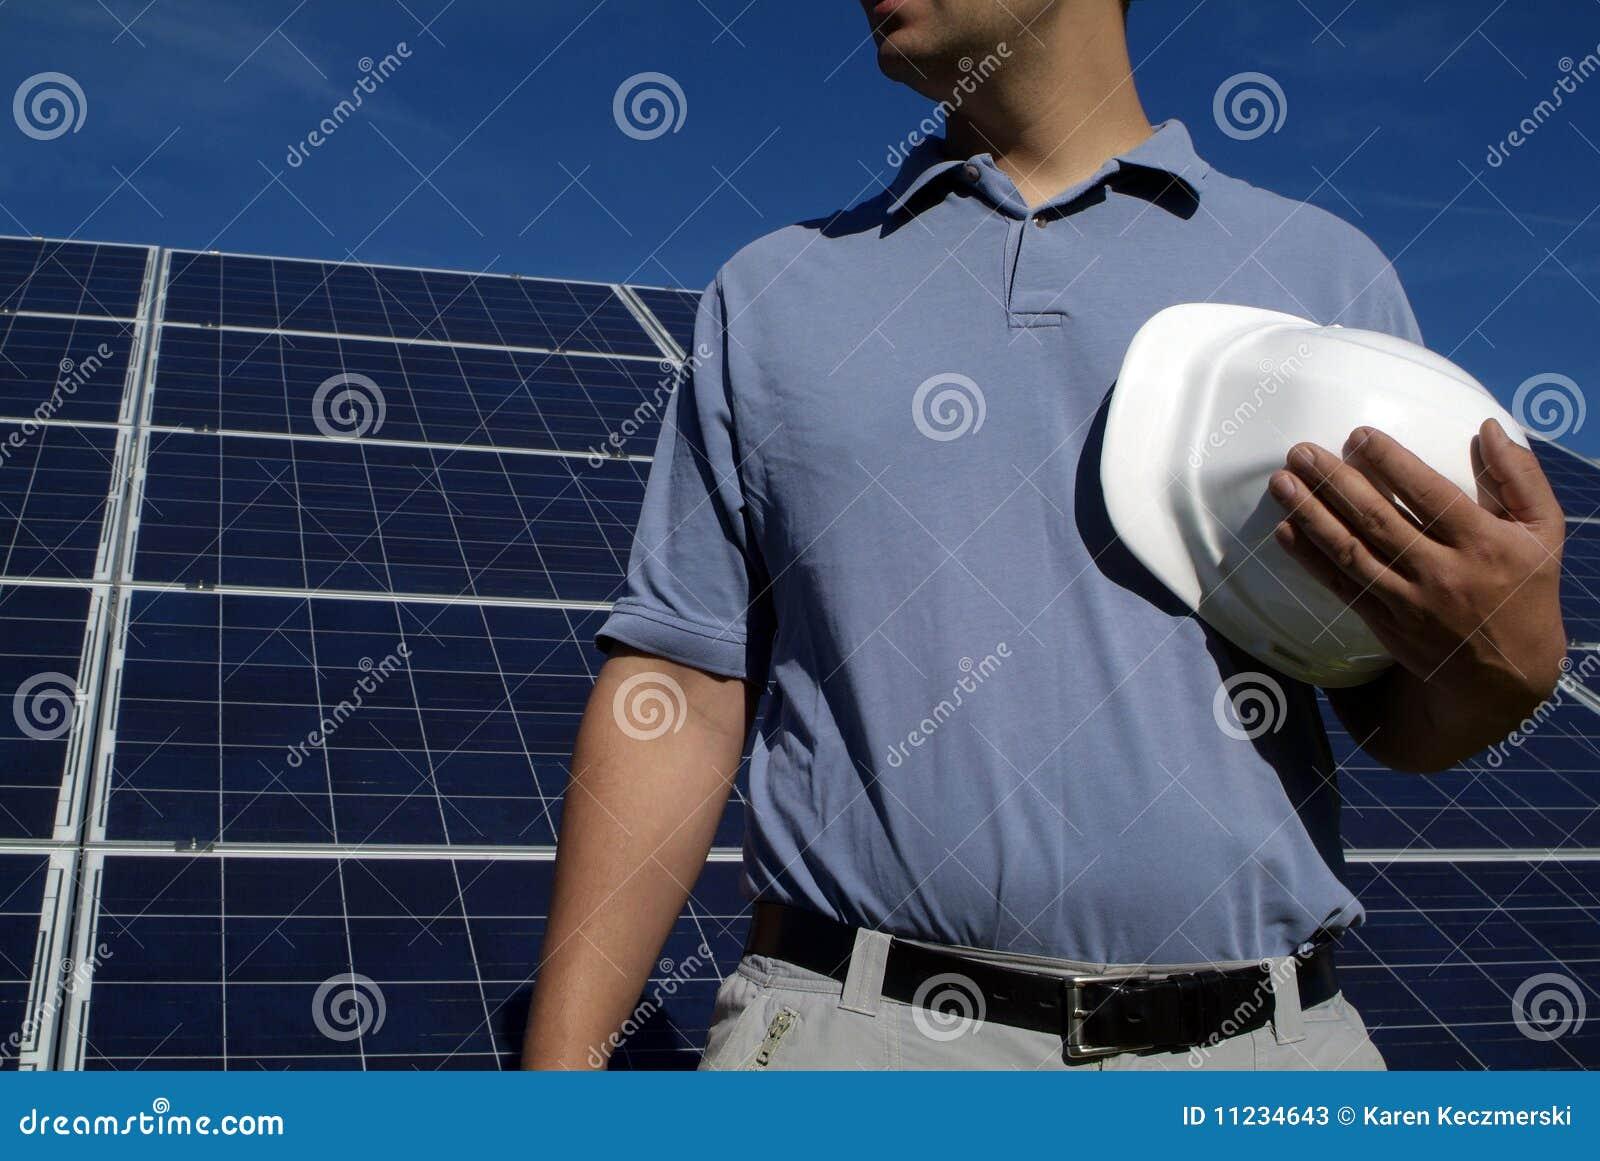 Eco green solar construction job